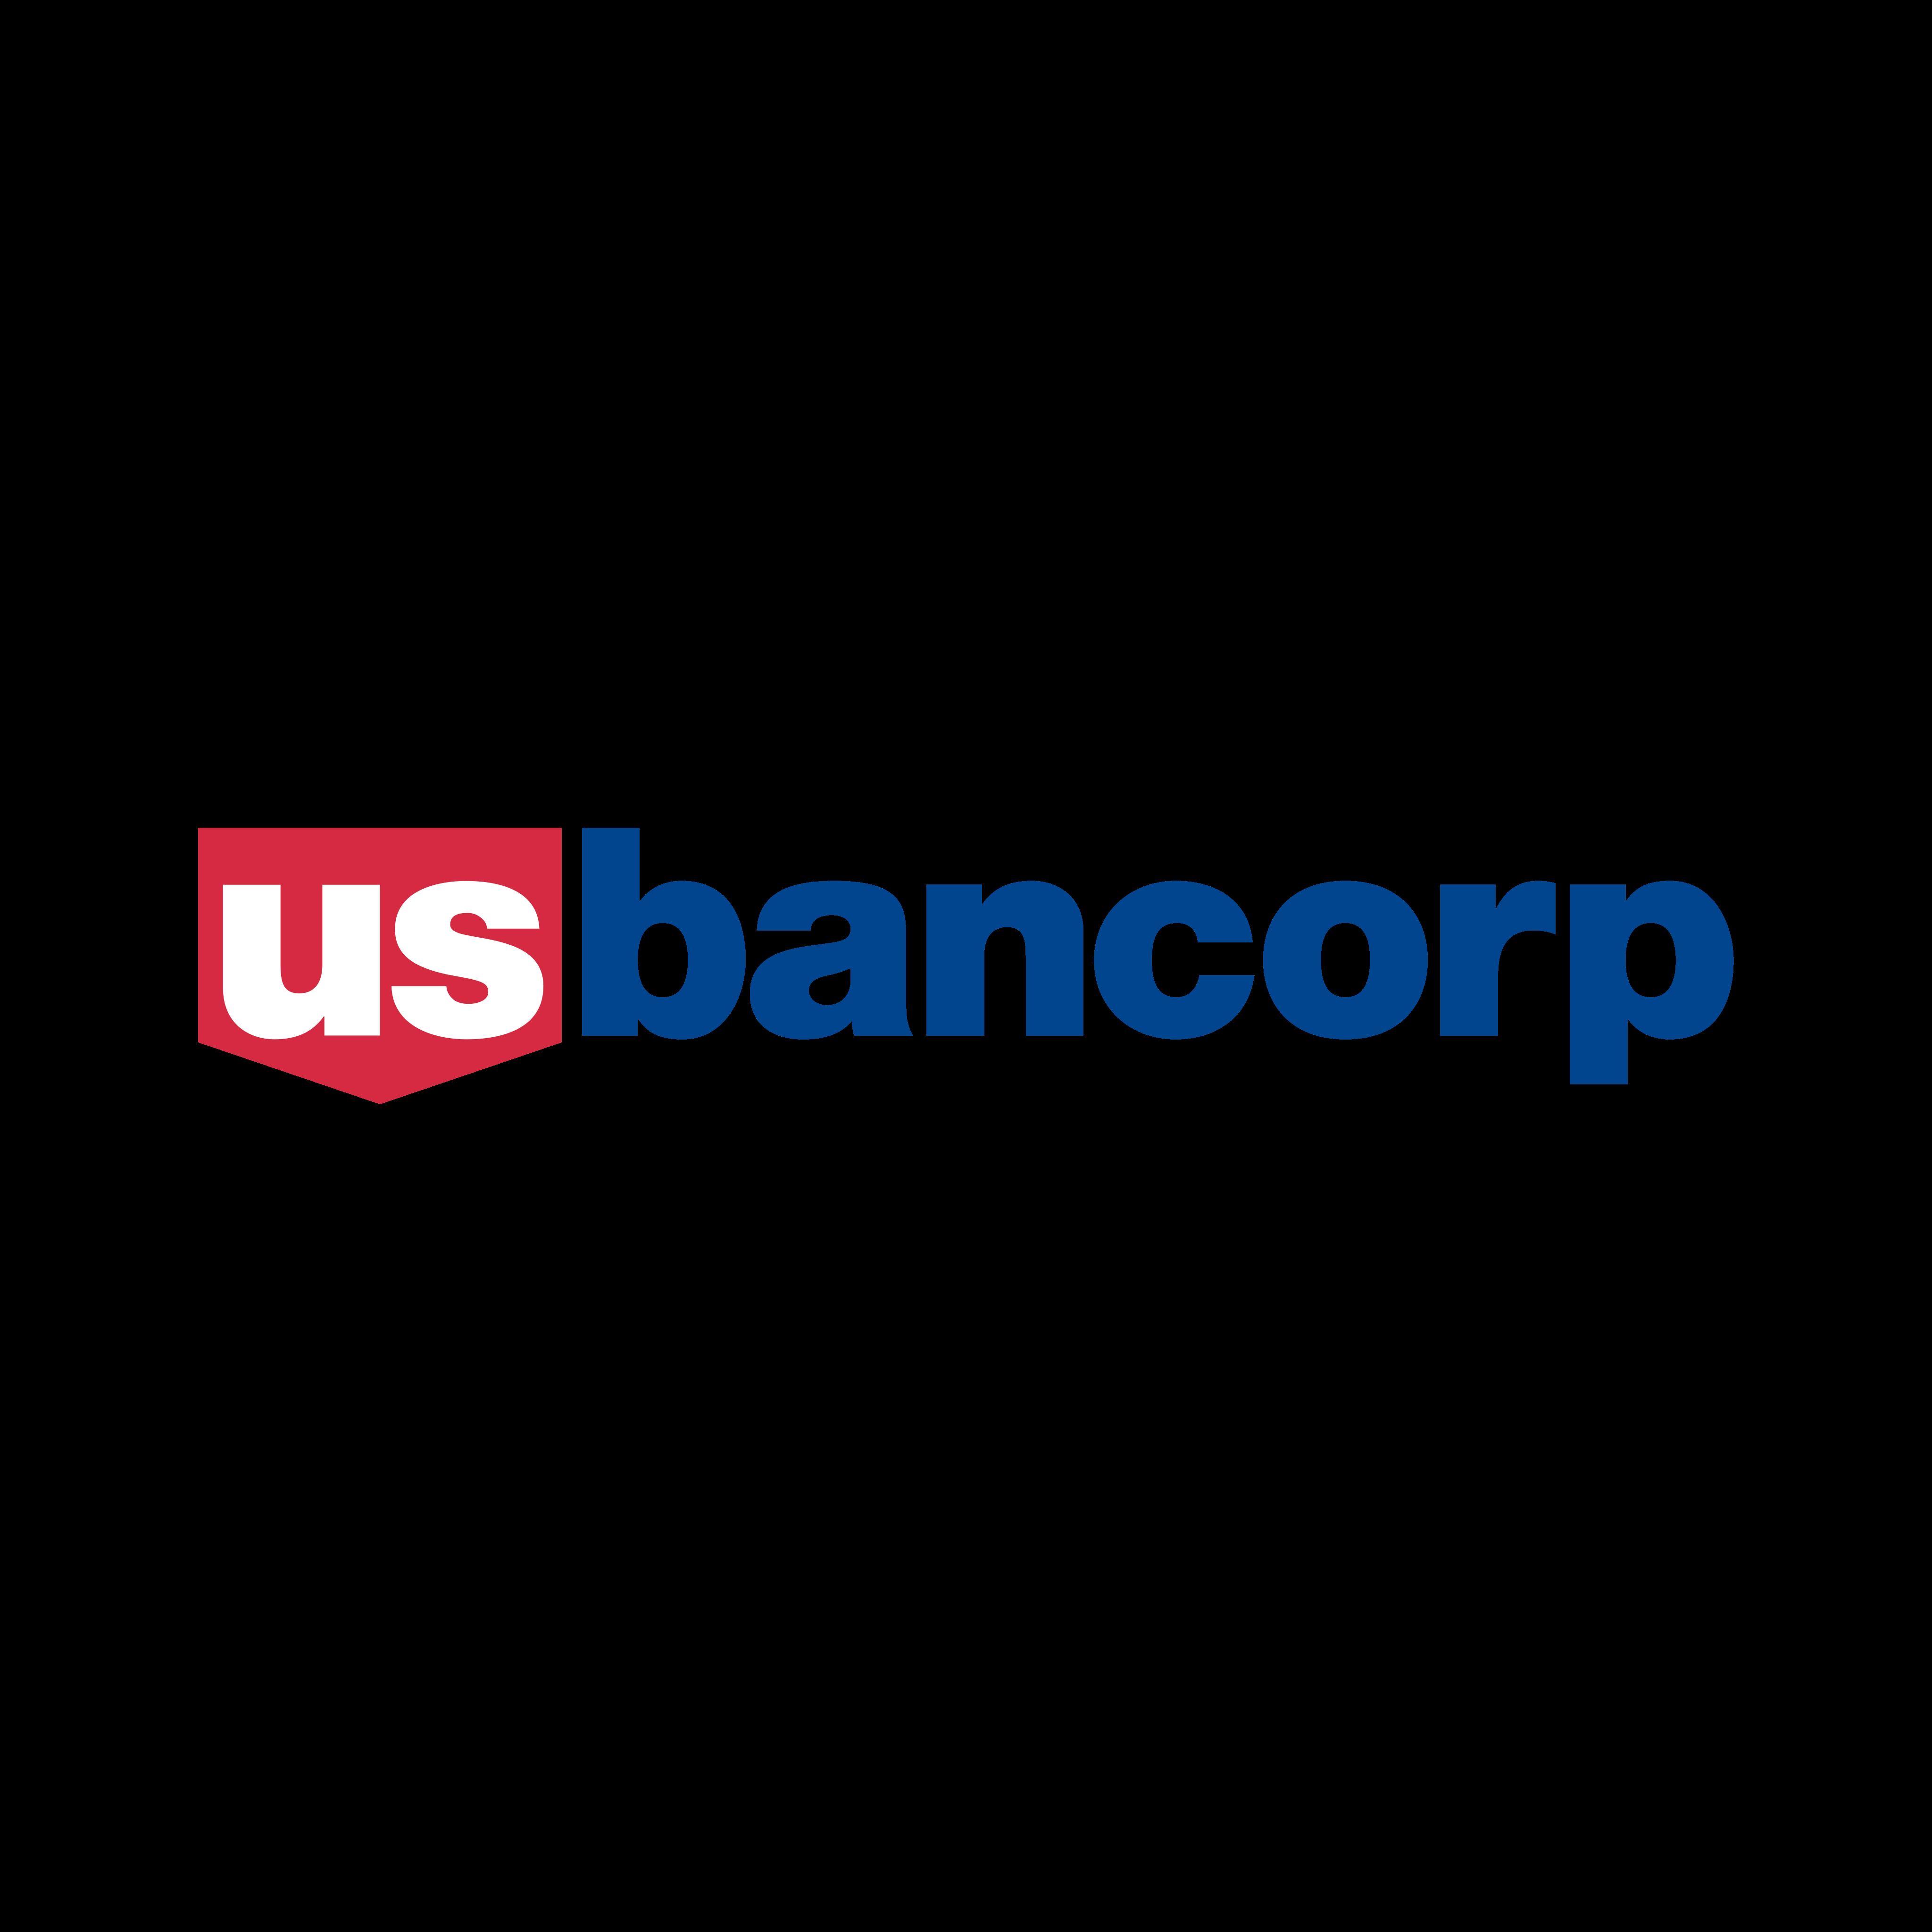 us bancorp logo 0 - U.S. Bancorp Logo